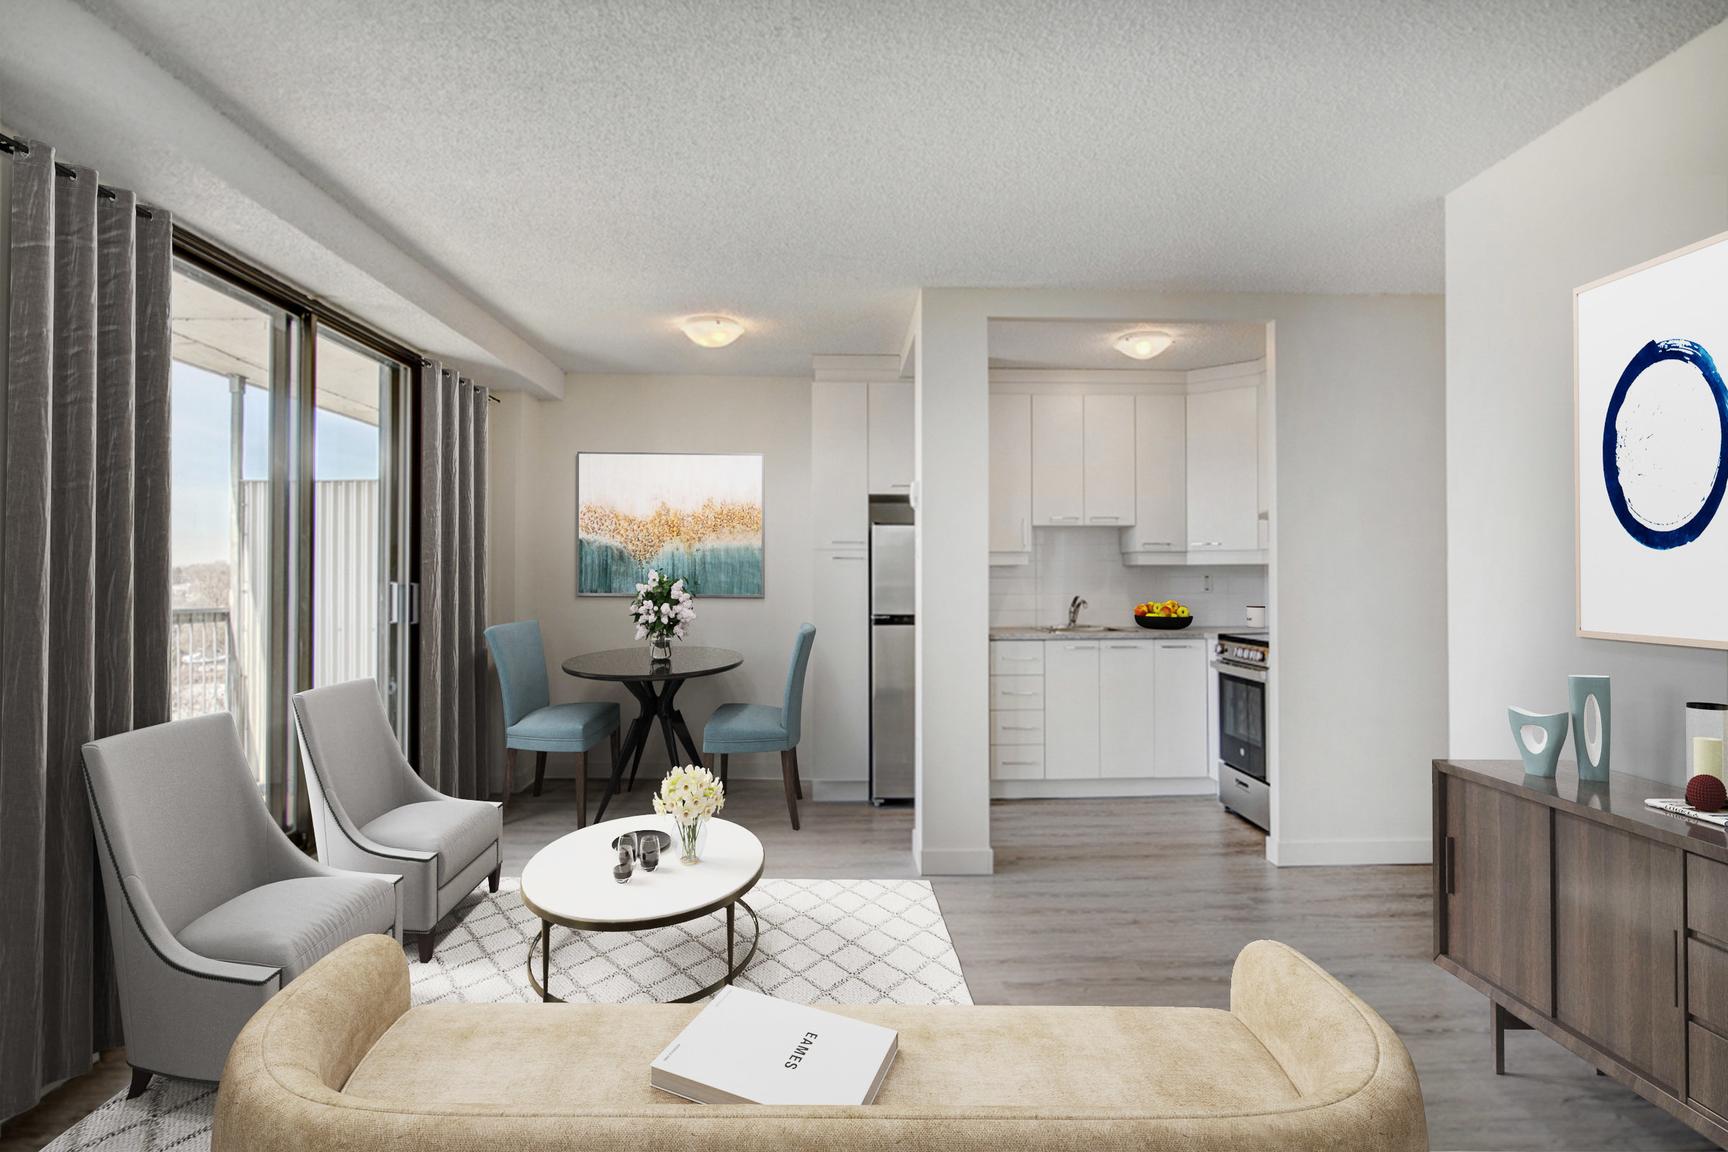 1 bedroom Apartments for rent in Laval at Le Quatre Cent - Photo 06 - RentQuebecApartments – L407184